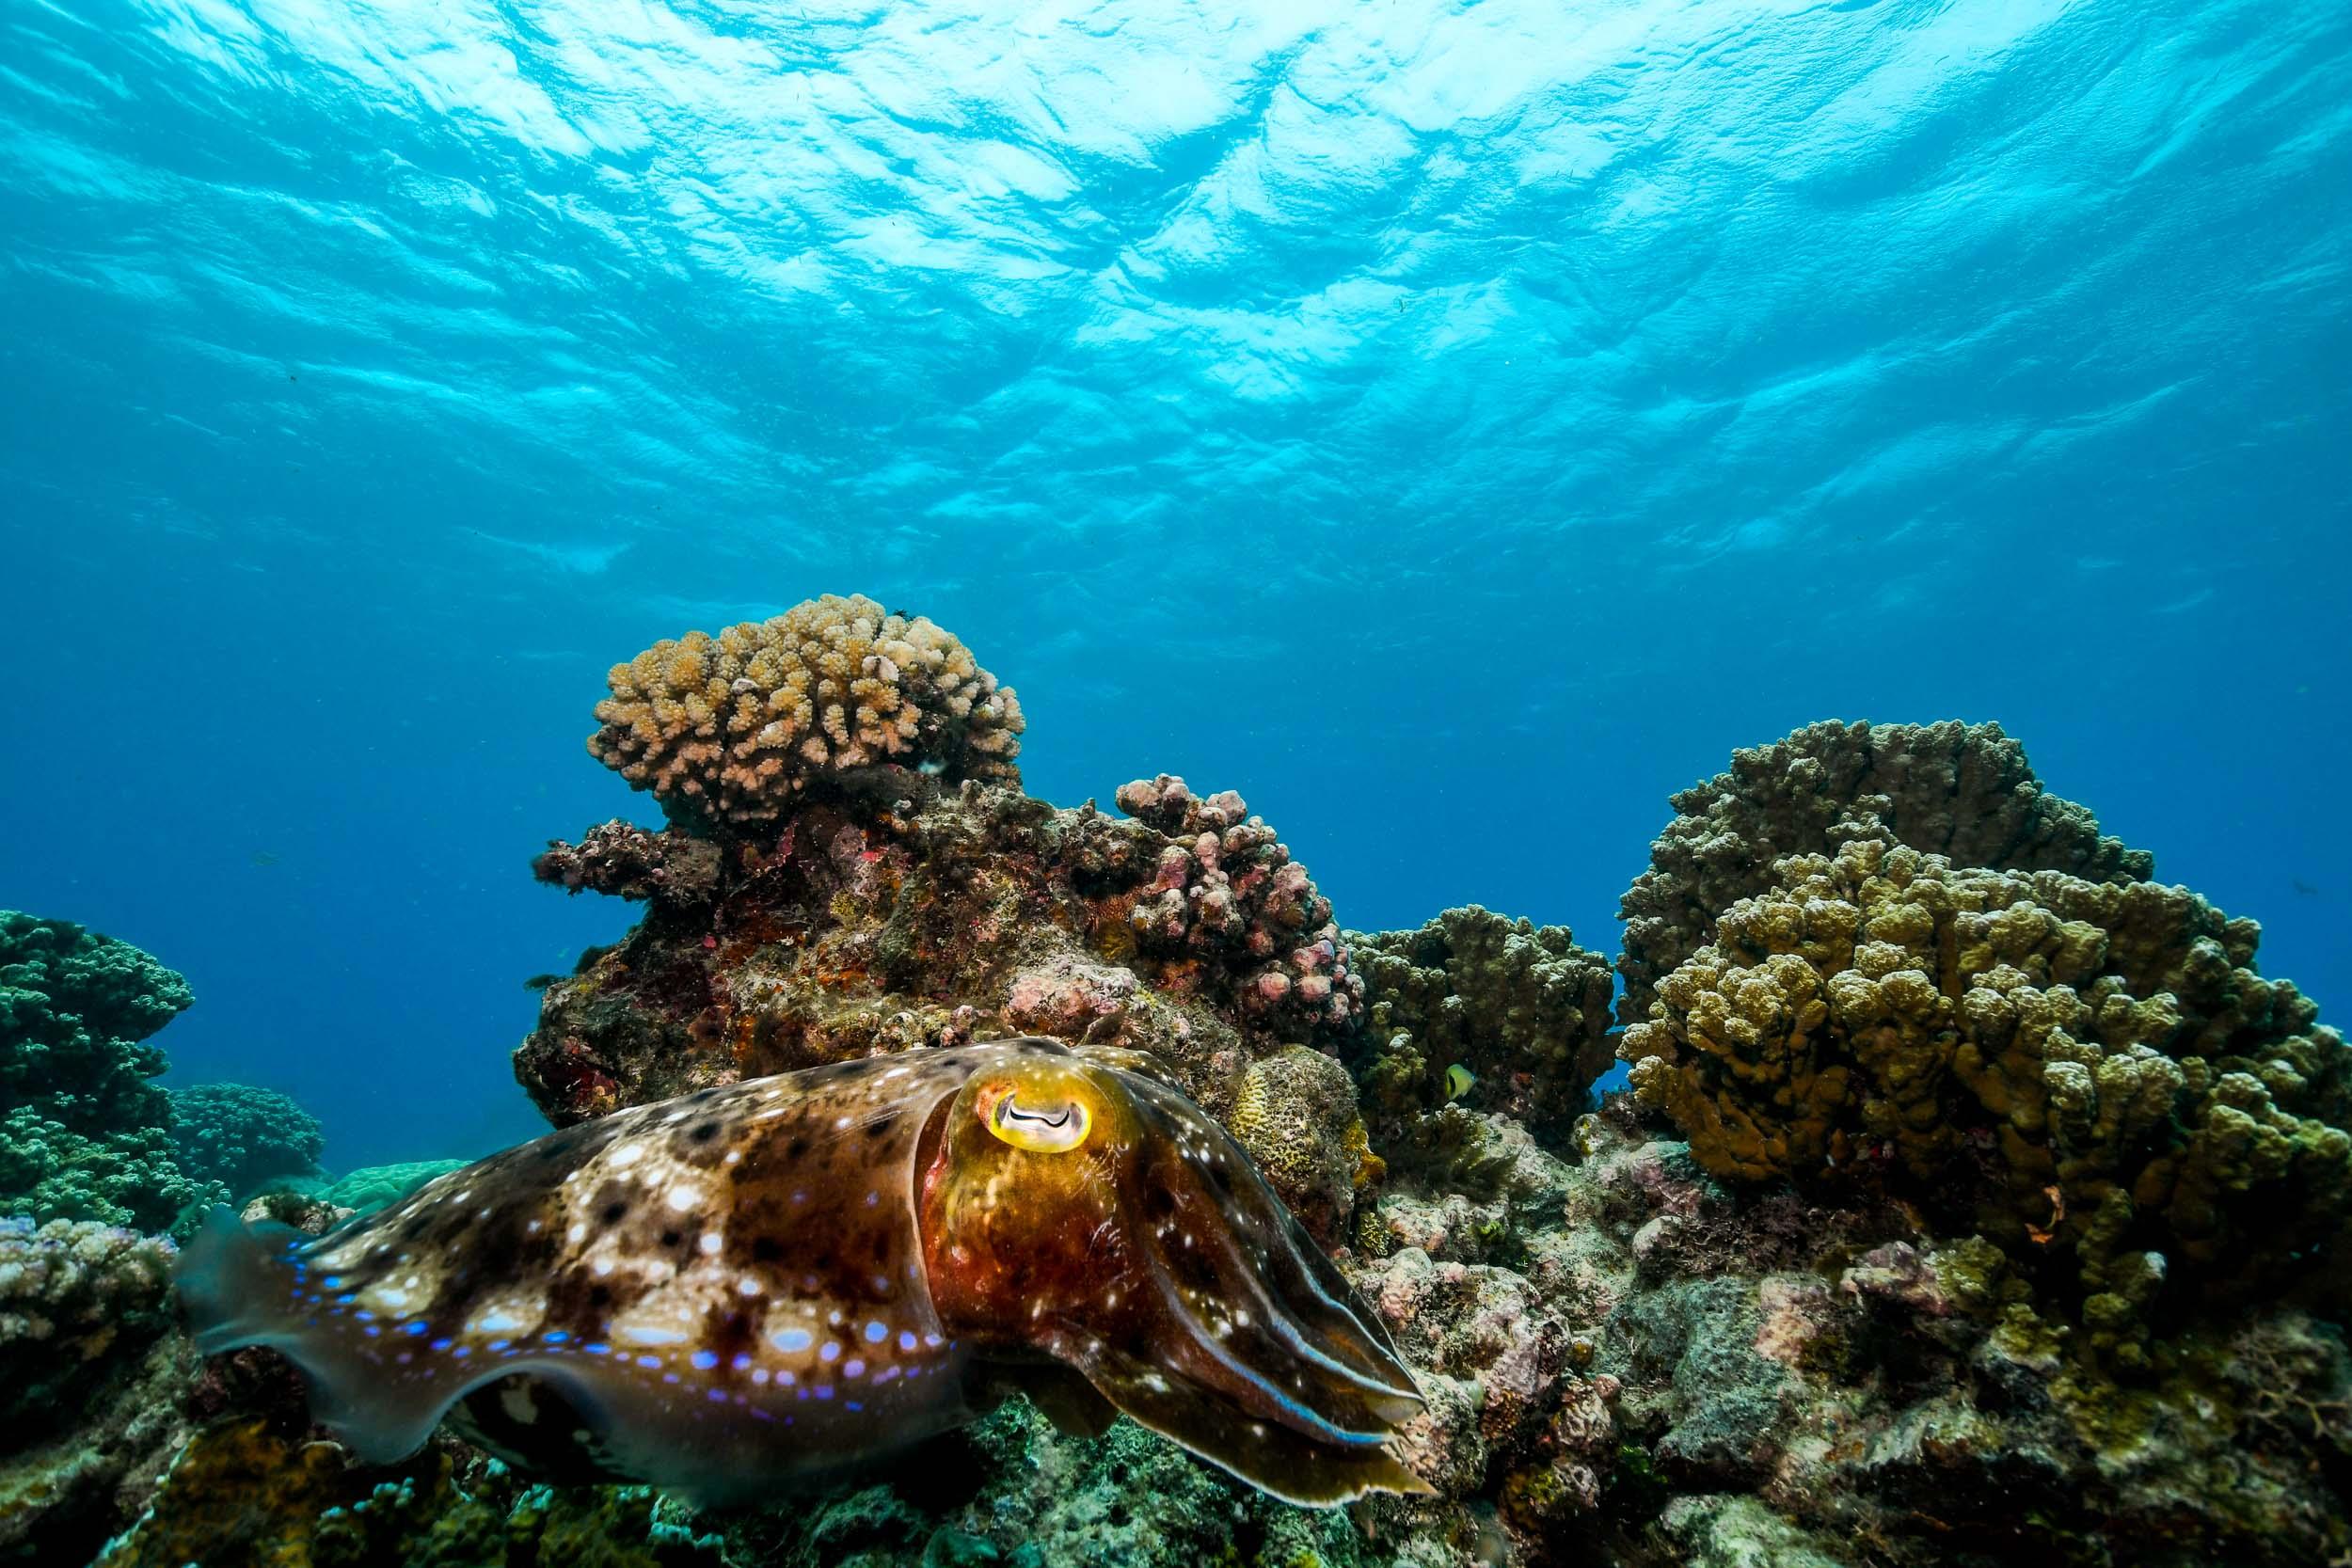 cuttlefish-great-barrier-reef-port-douglas-australia-1.jpg